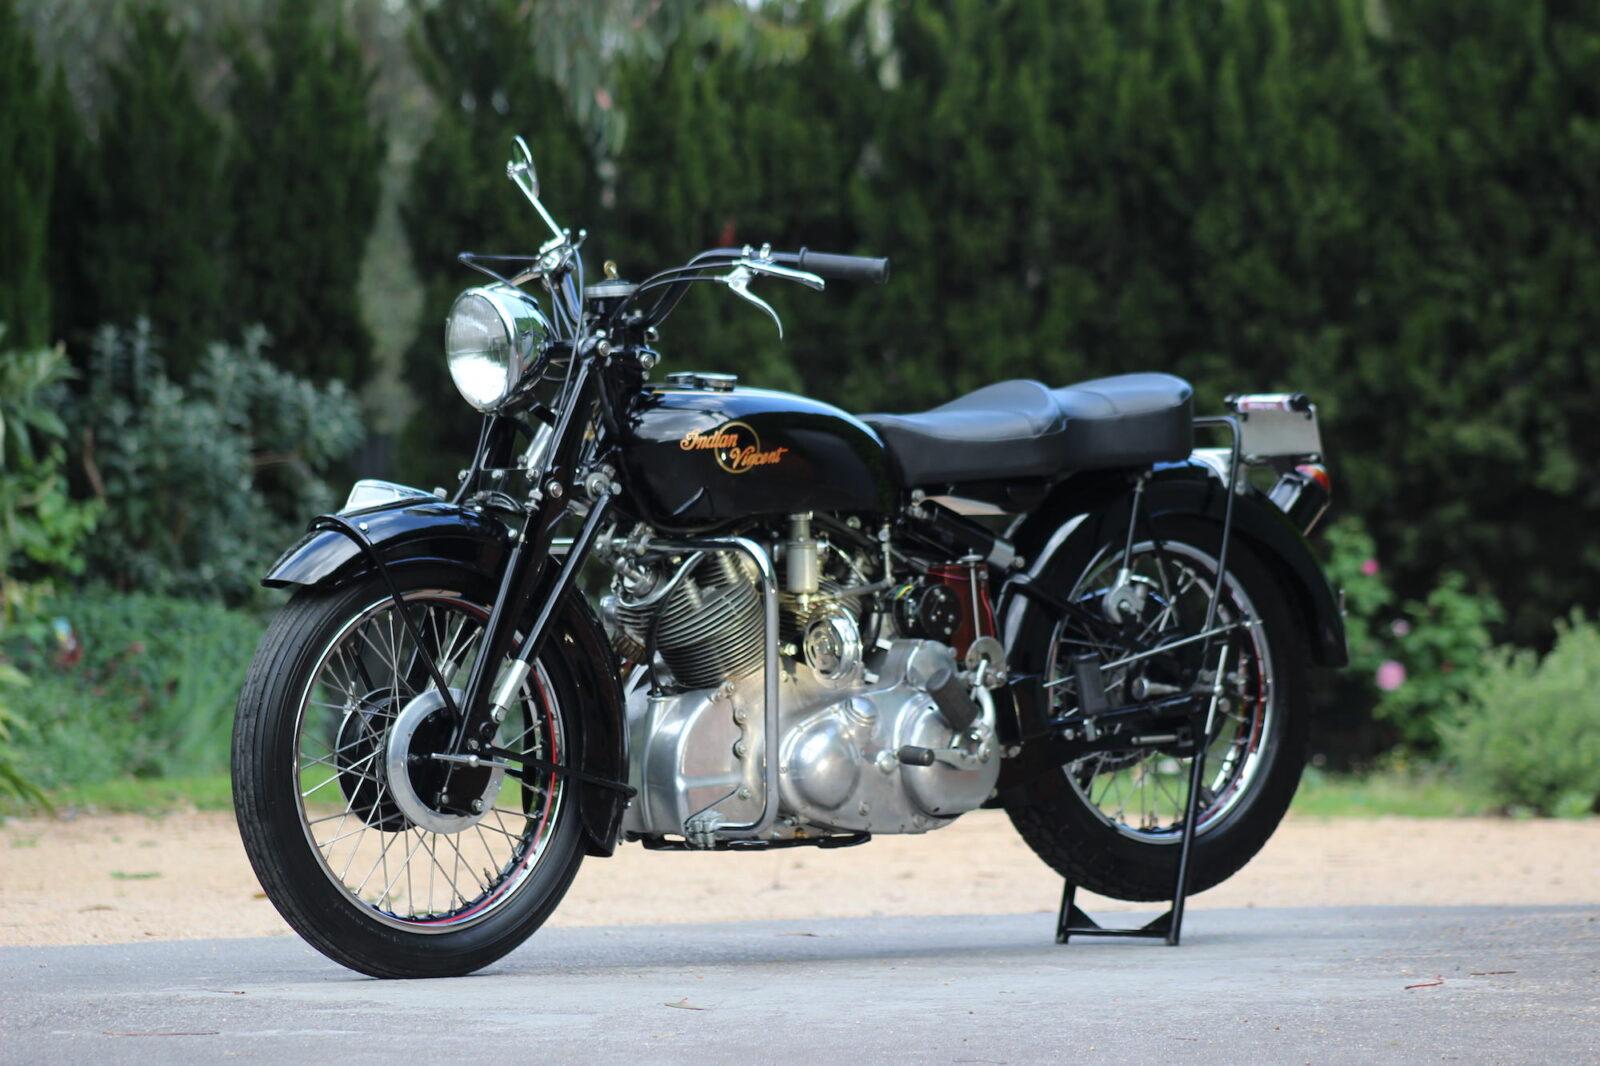 24119514 1 13 1600x1066 - 1949 Indian-Vincent Prototype